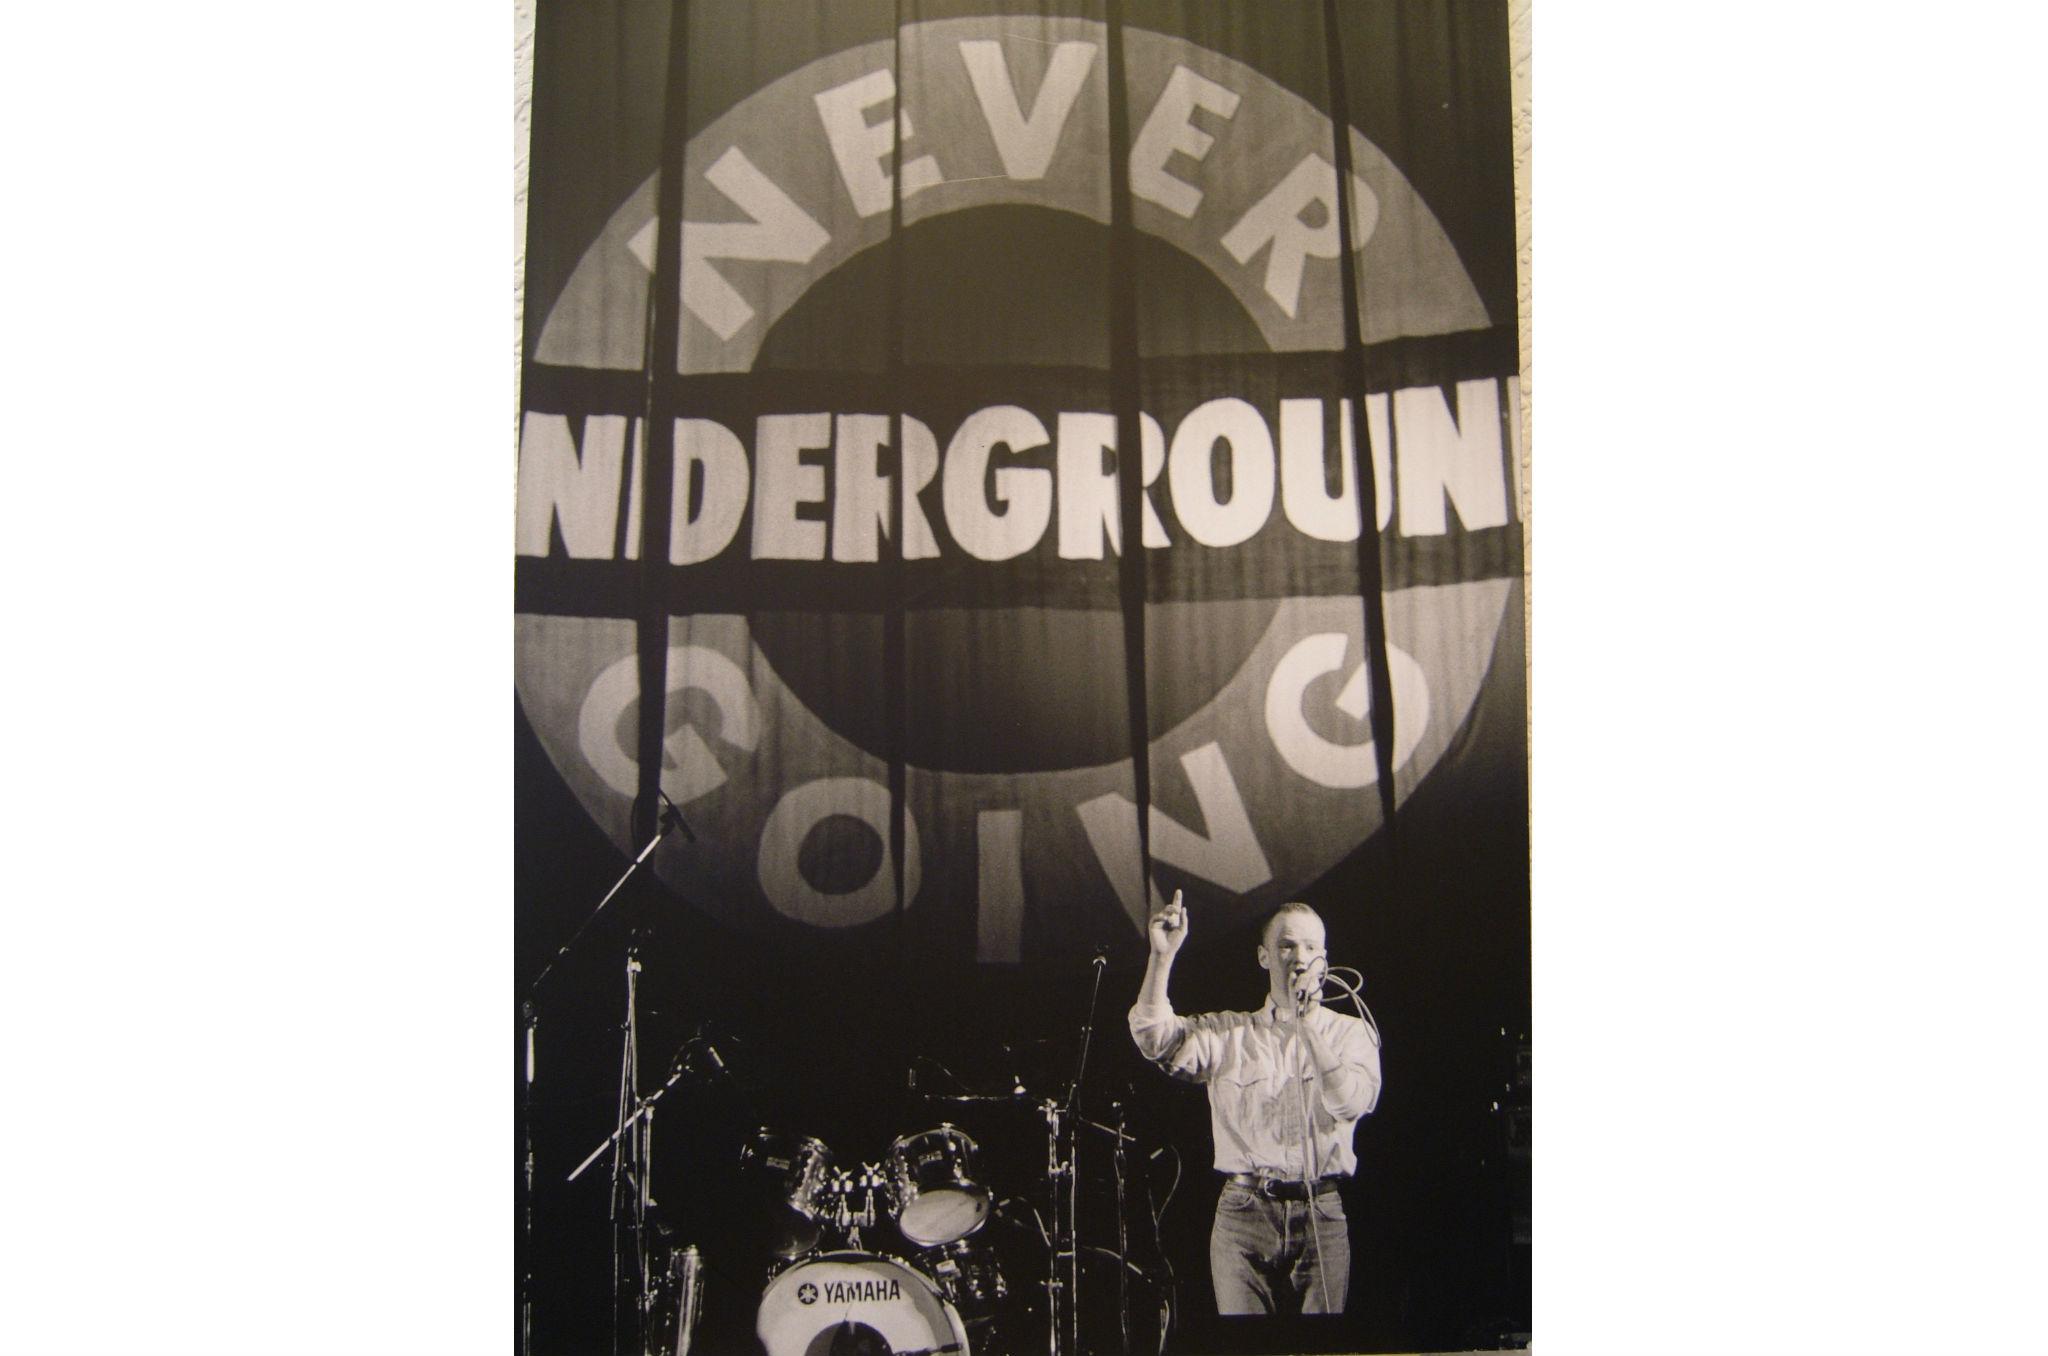 Never Going Underground